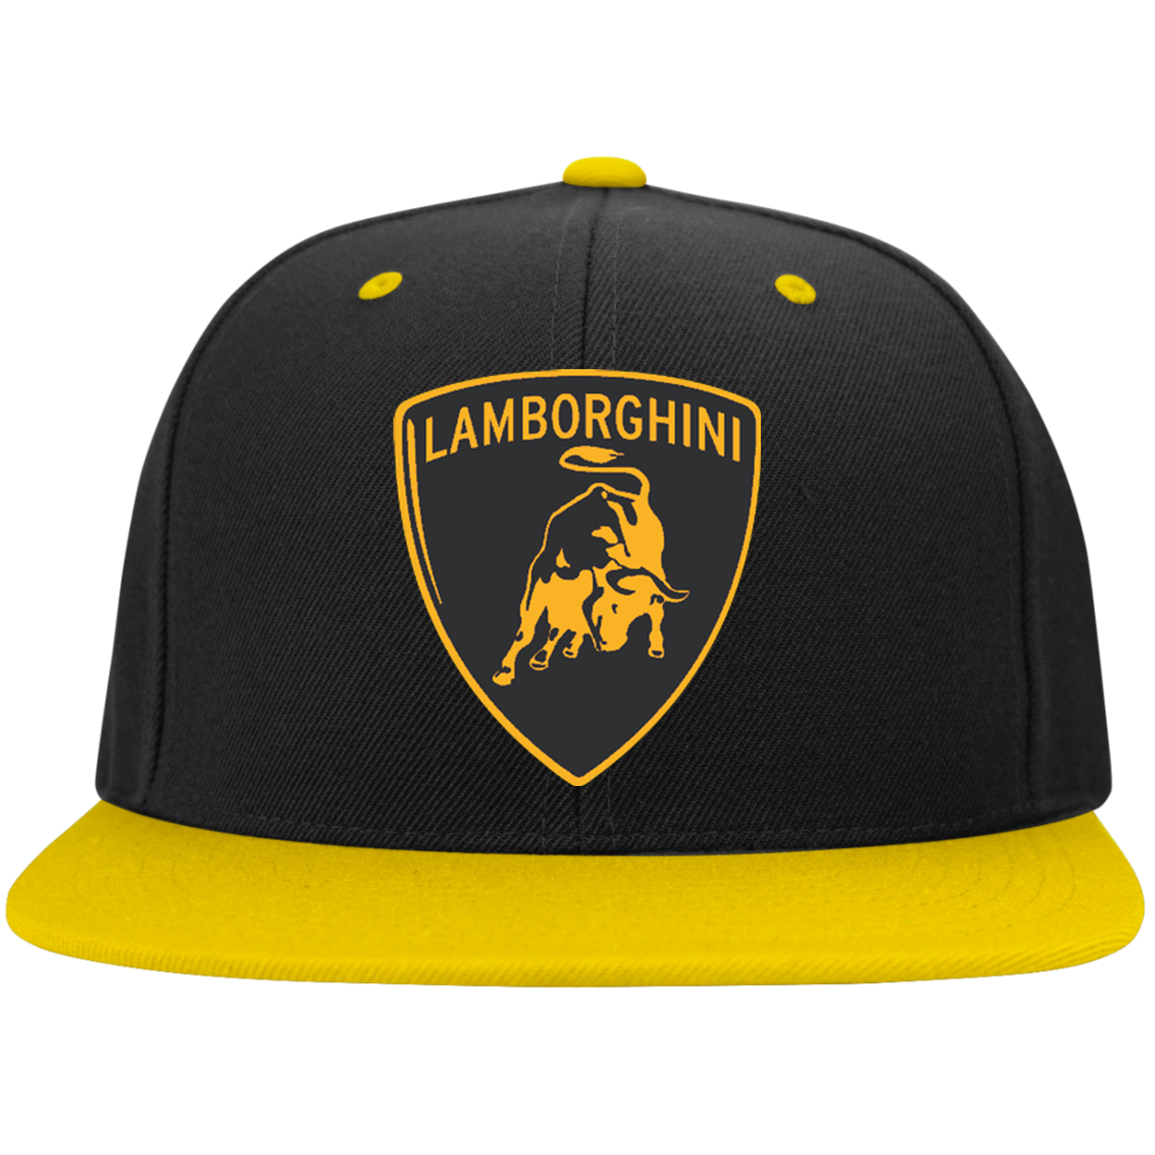 Lamborghini STC19 Sport-Tek Flat Bill High-Profile Snapback Hat ... 0a75b29b4e0